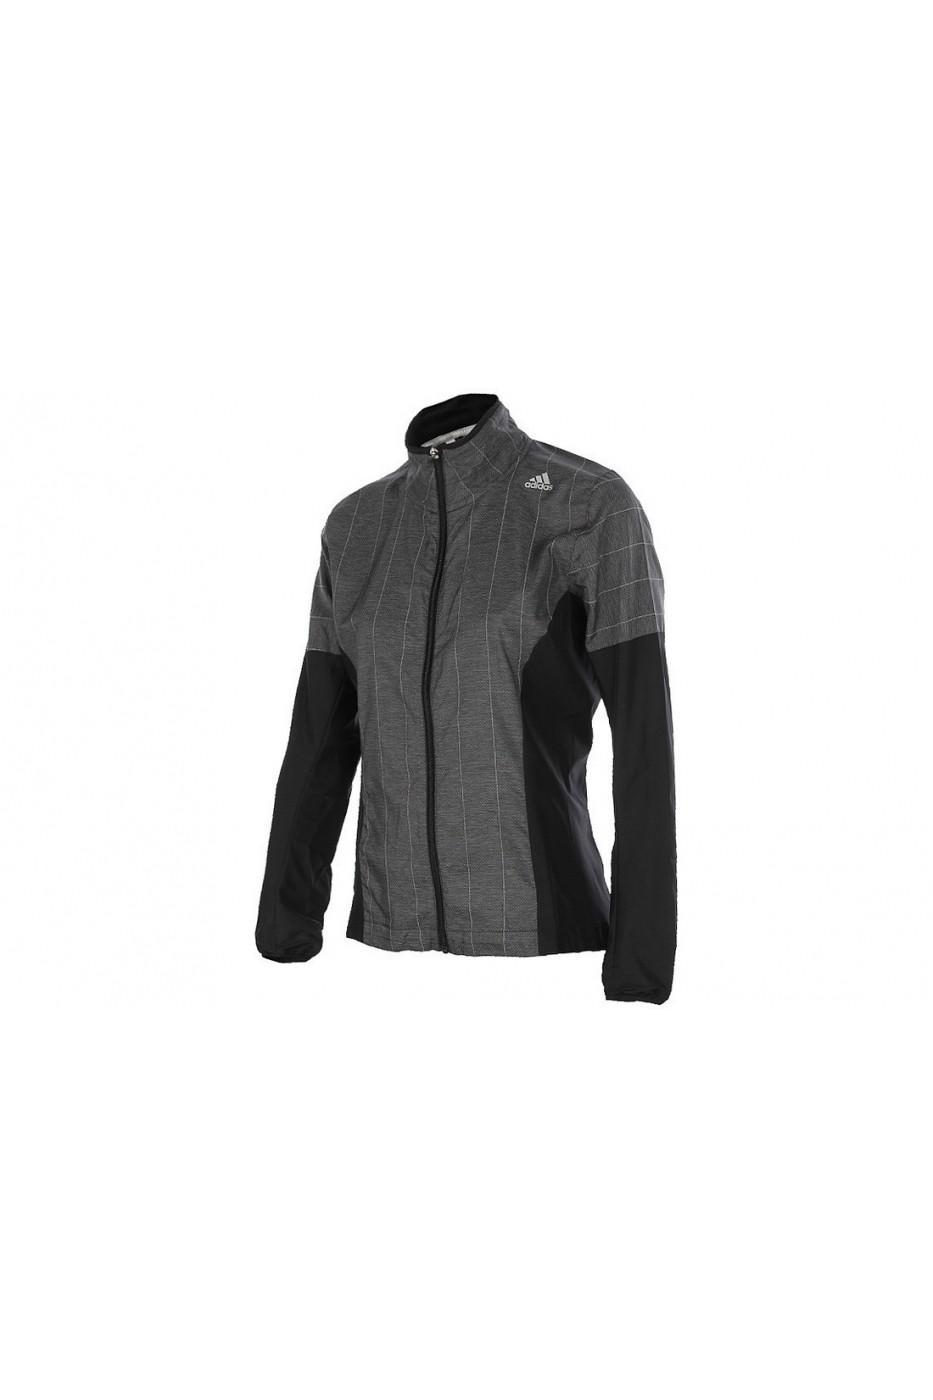 adidas Kabát BUT-G89631 - FashionUP! 45e23a6b47